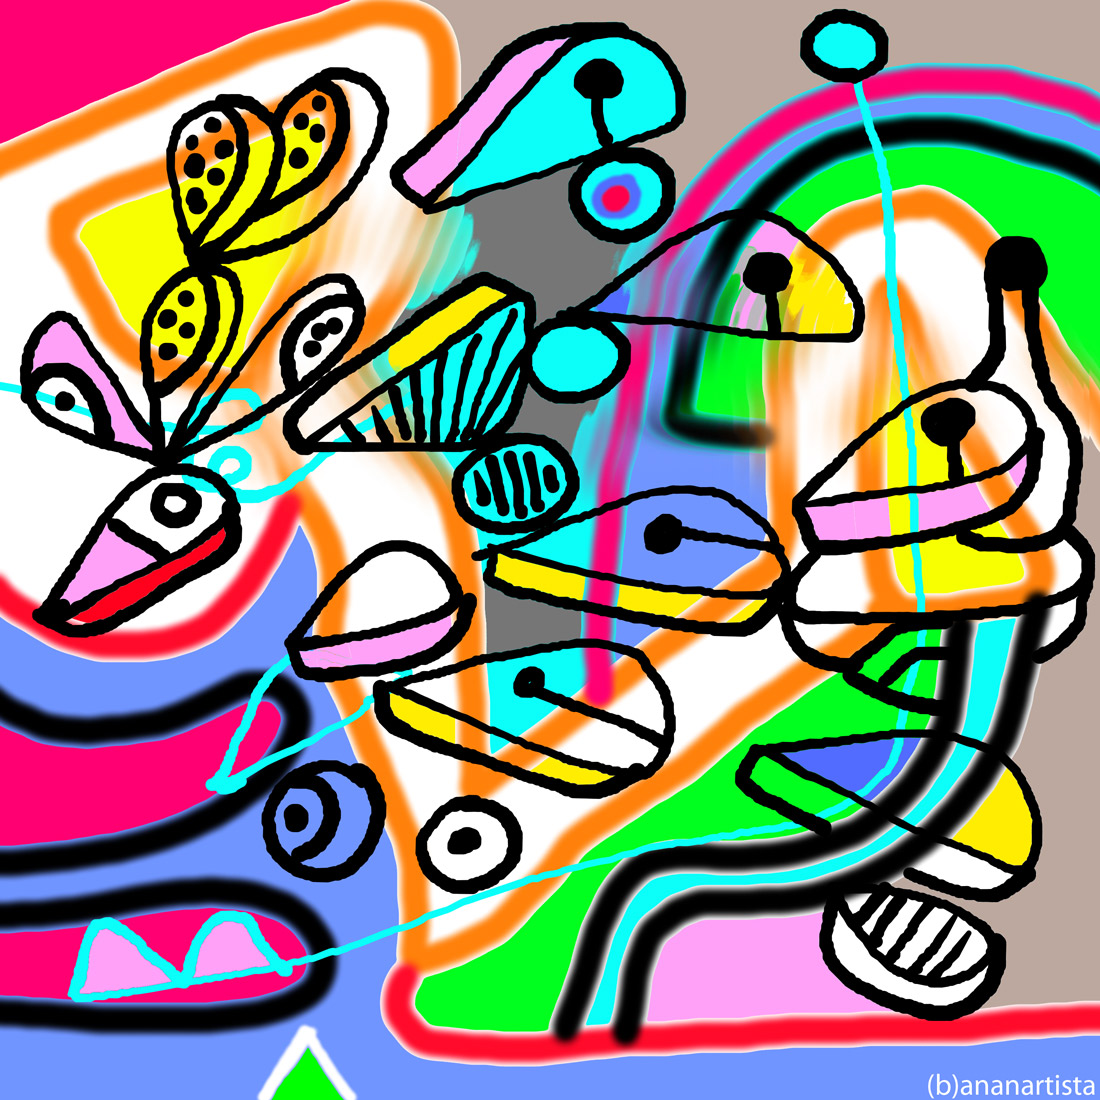 un percorso divertente e coloratissimo : digital abstract contemporary art by (b)ananartista sbuff